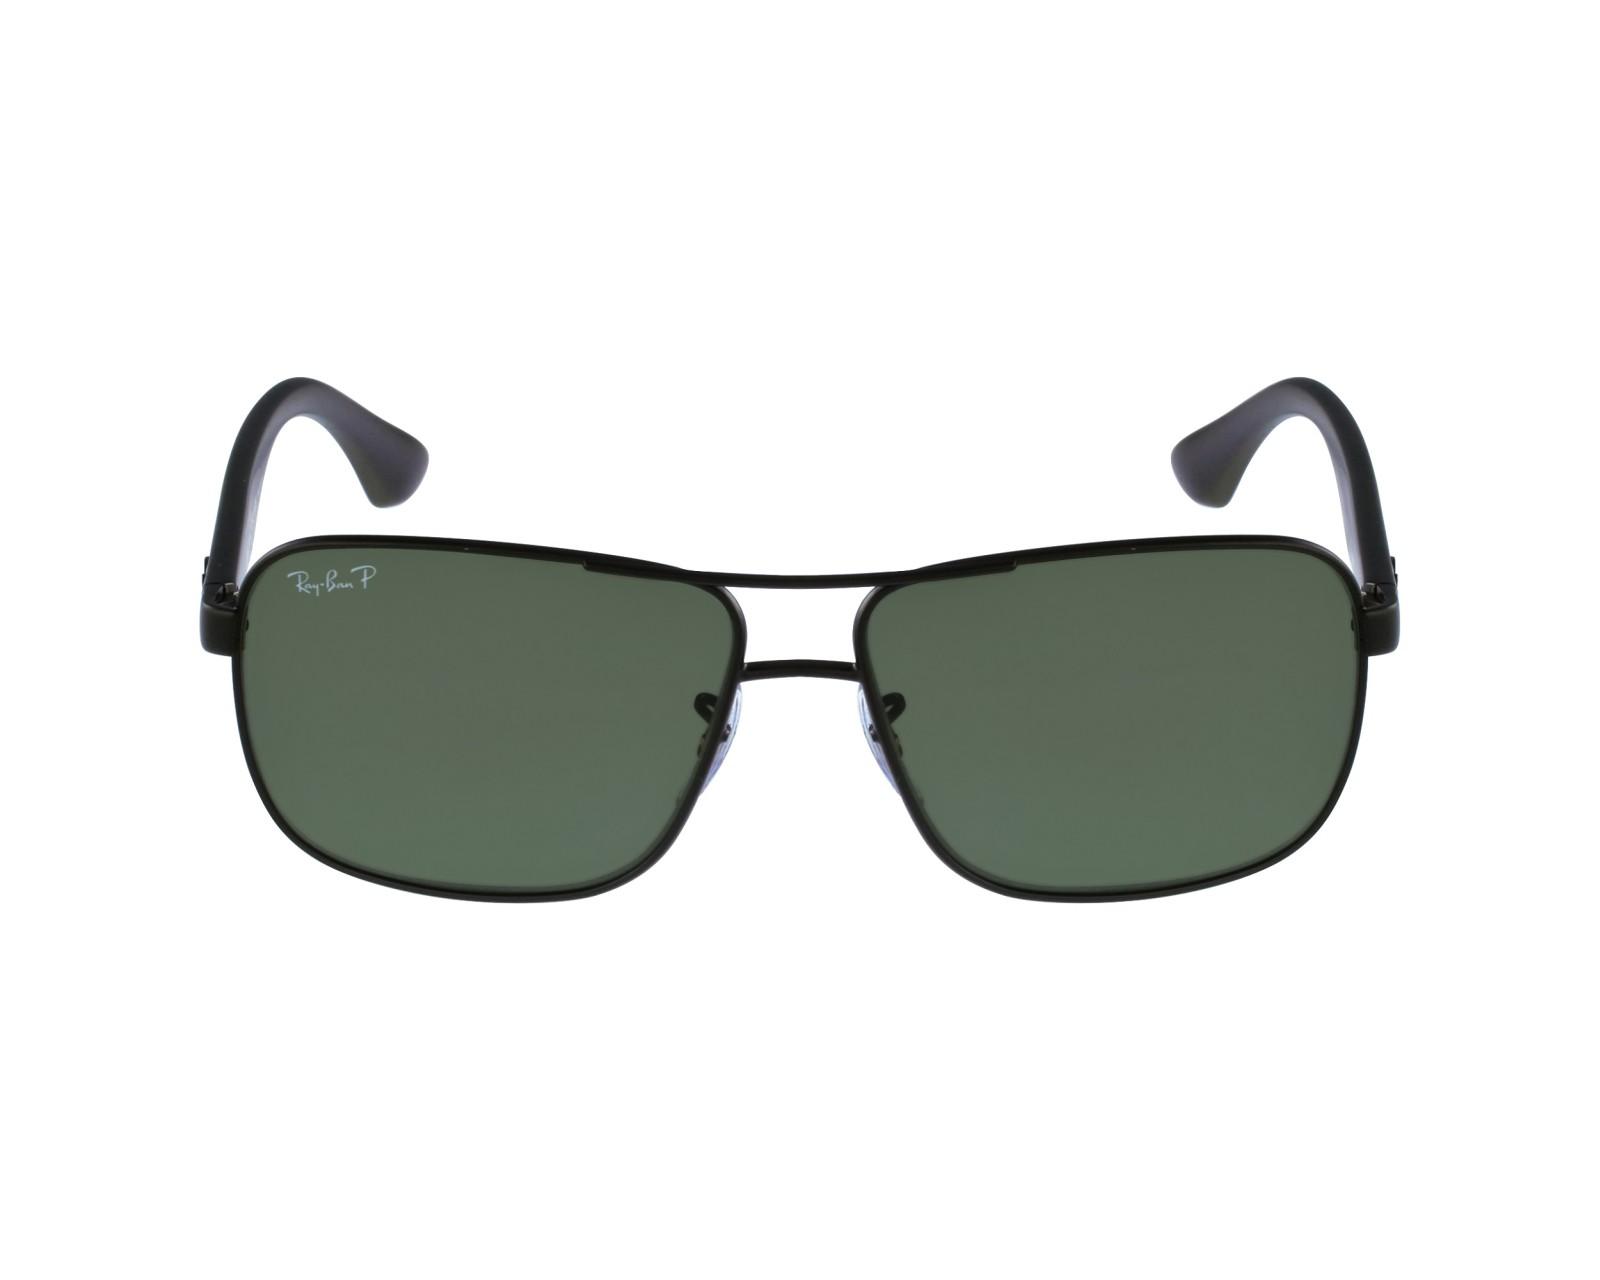 527f4ec8901 Polarized. Sunglasses Ray-Ban RB-3516 006 9A - Black profile view